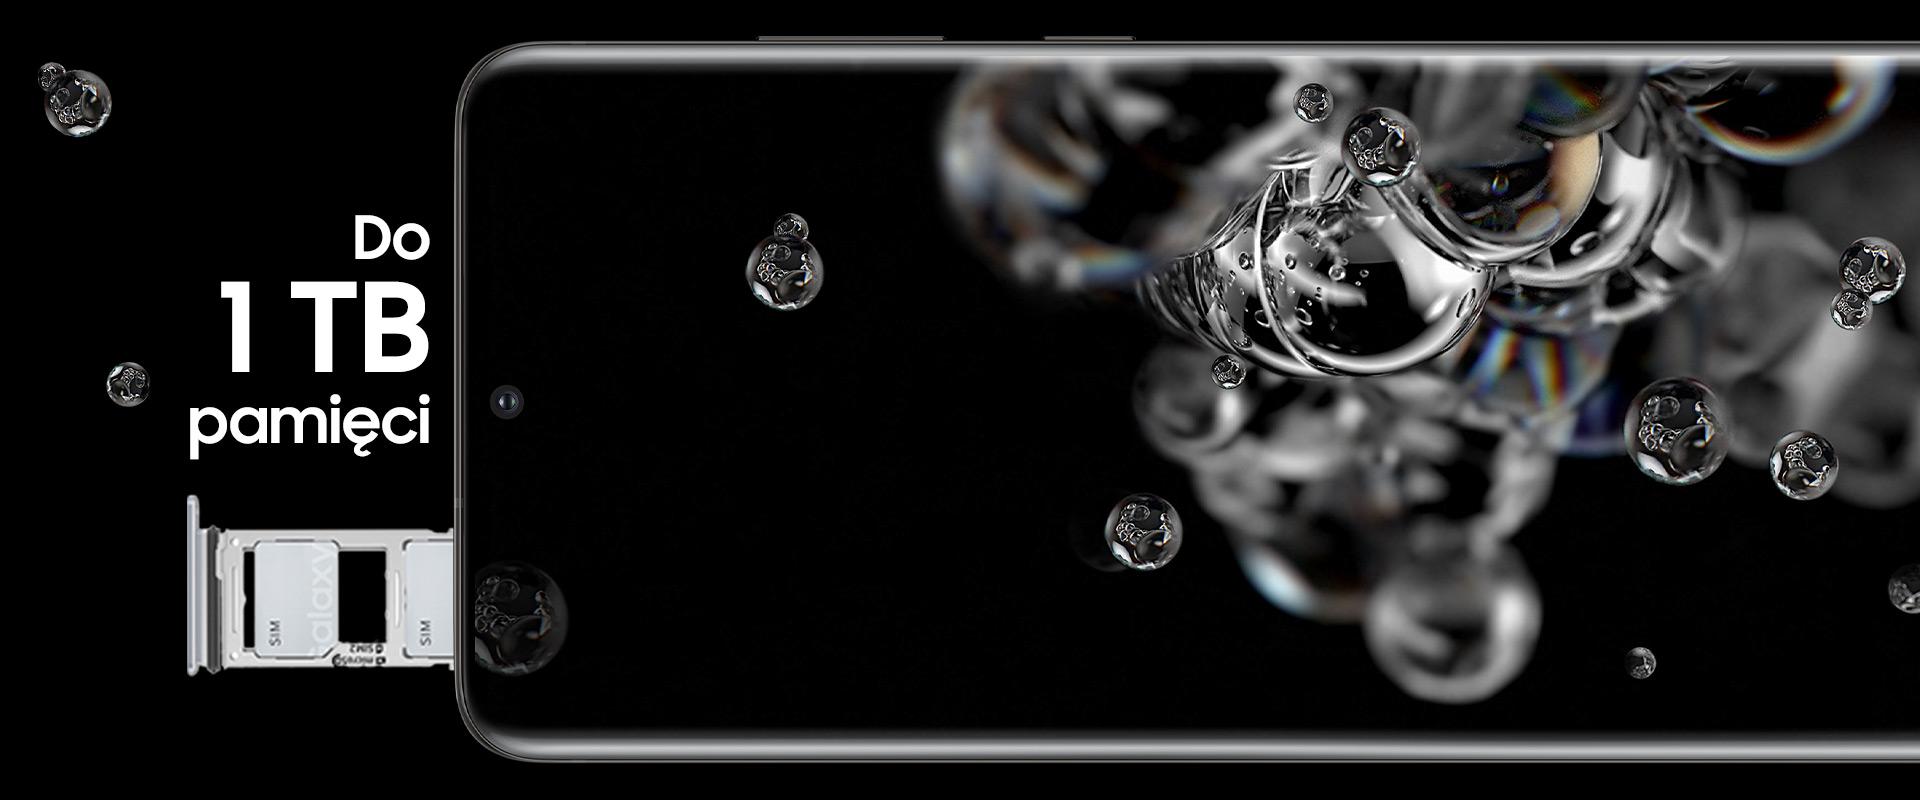 Samsung Galaxy S20 Ultra 5G Pamiec 1920px